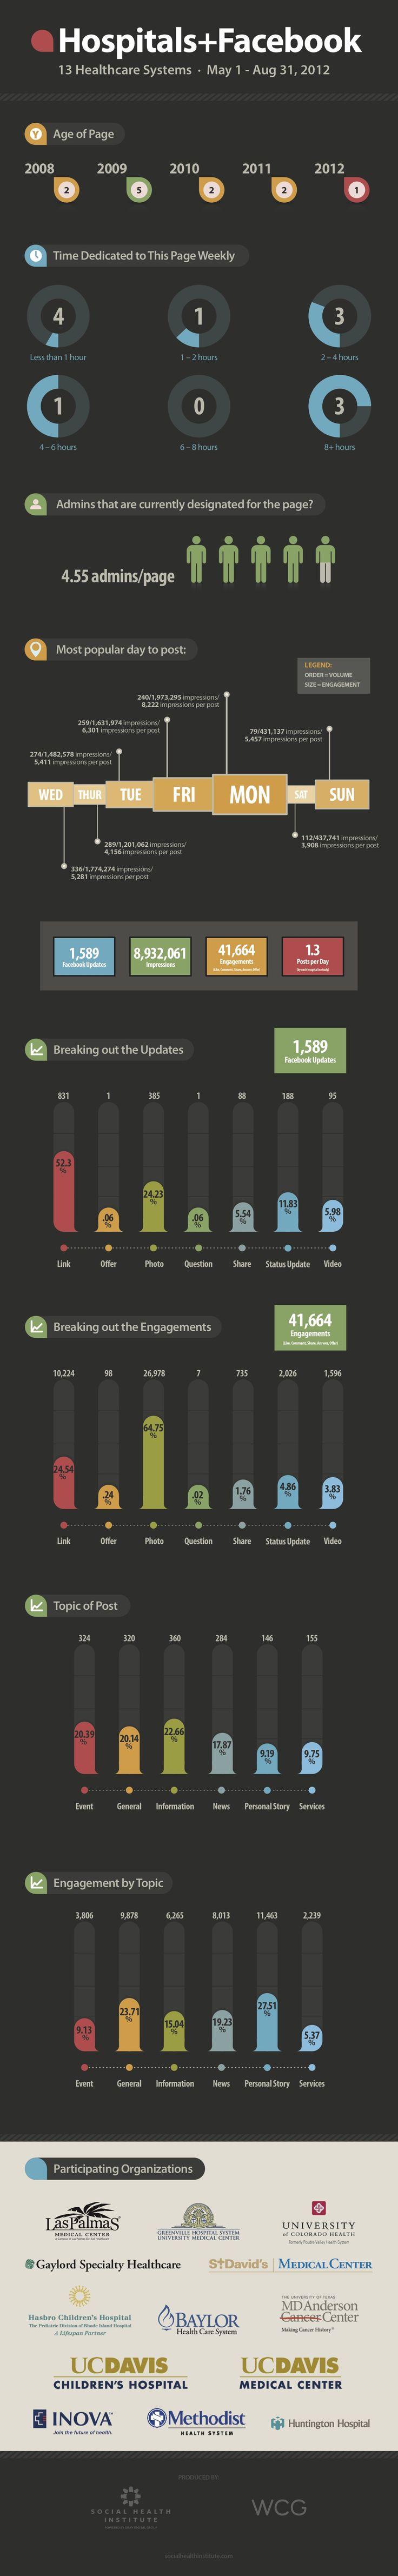 Hospitals + Facebook Infographic